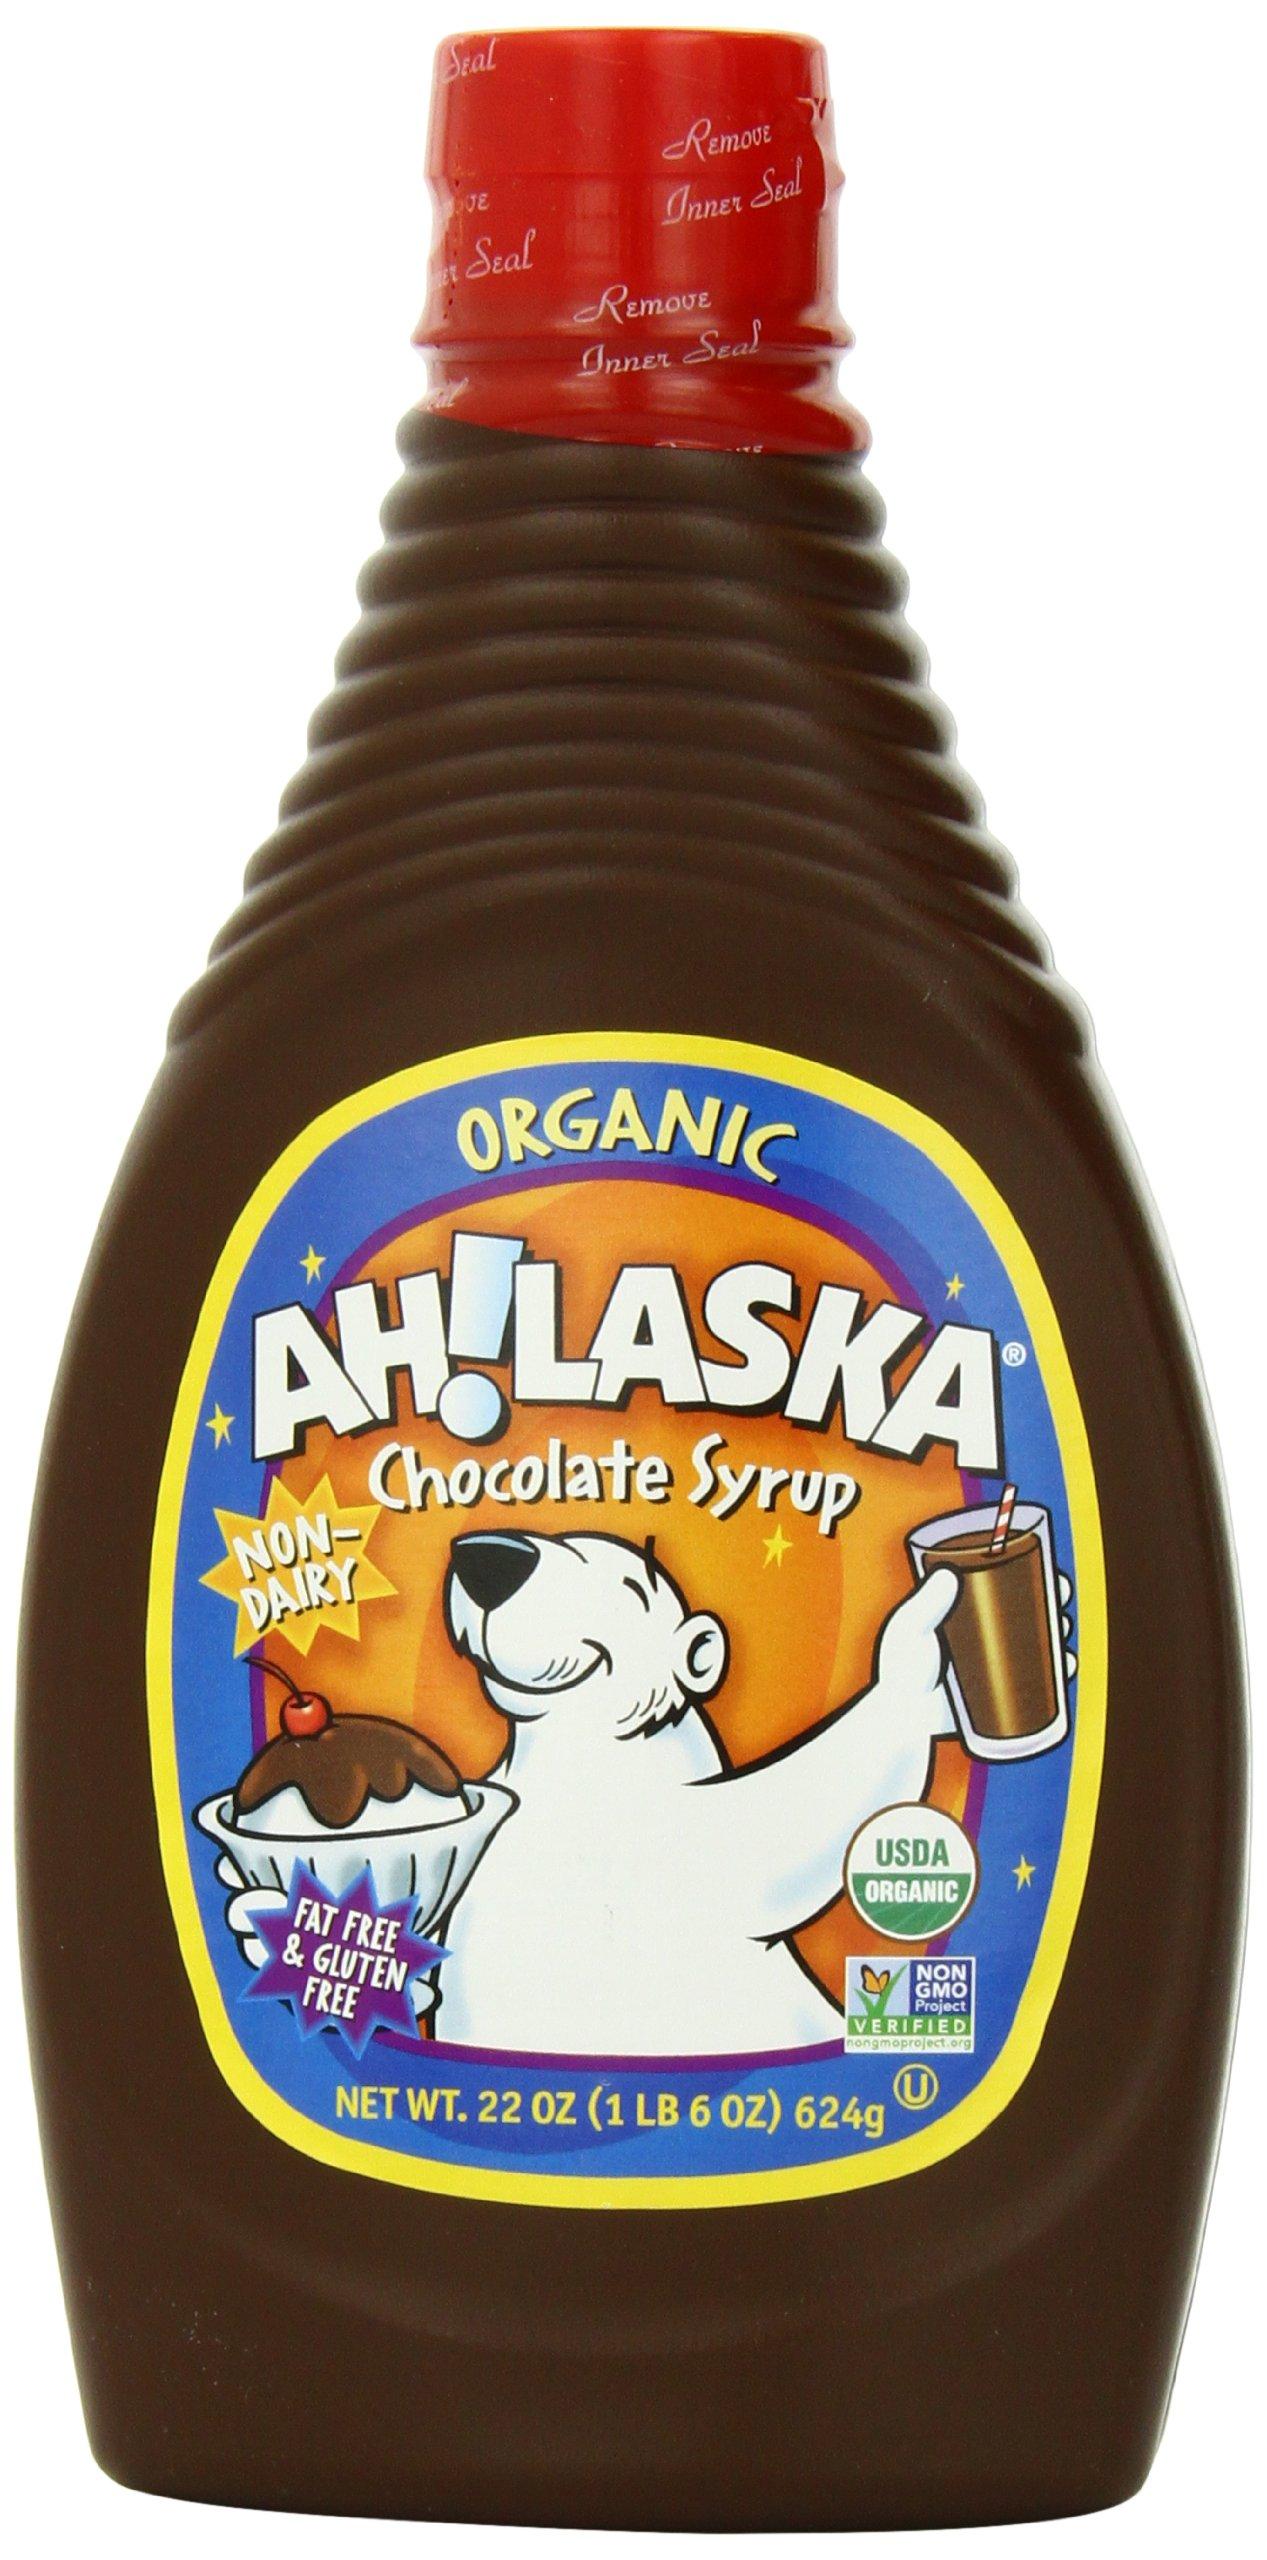 Ahlaska AH!LASKA Organic Chocolate Syrup, 22 Ounce (Pack of 4)